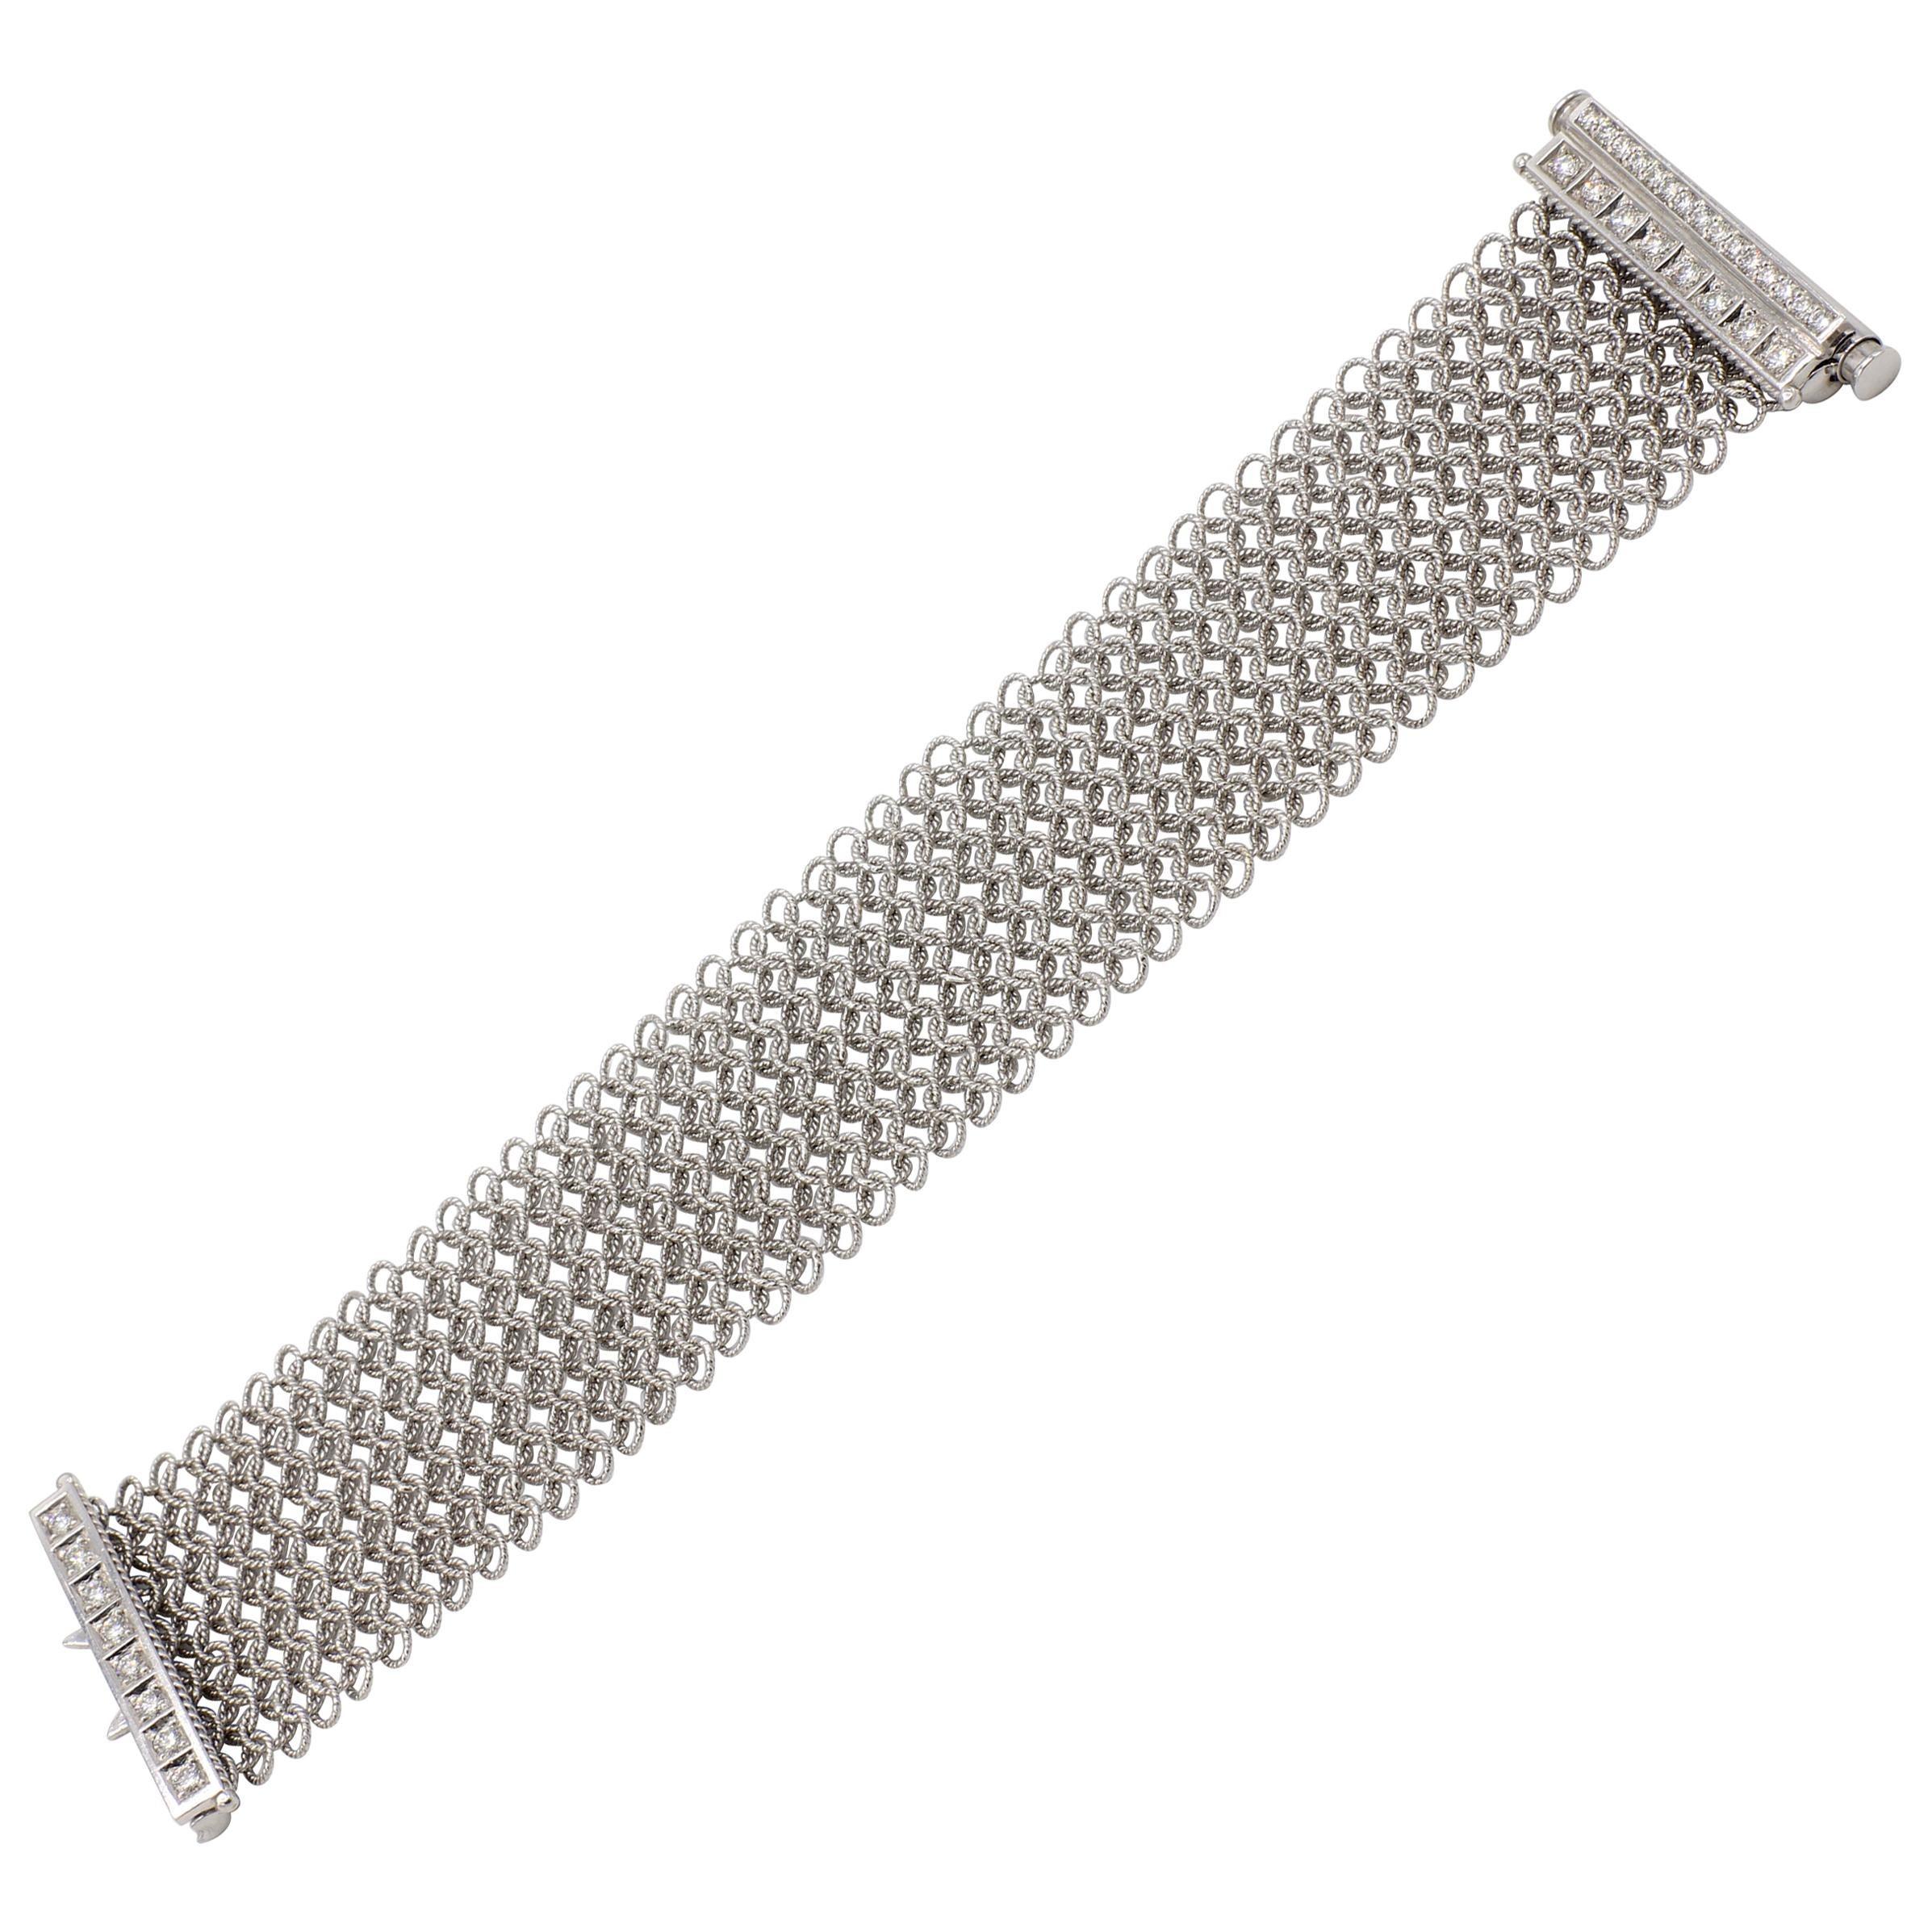 18 Karat White Gold Flexible Diamond Mesh Bracelet